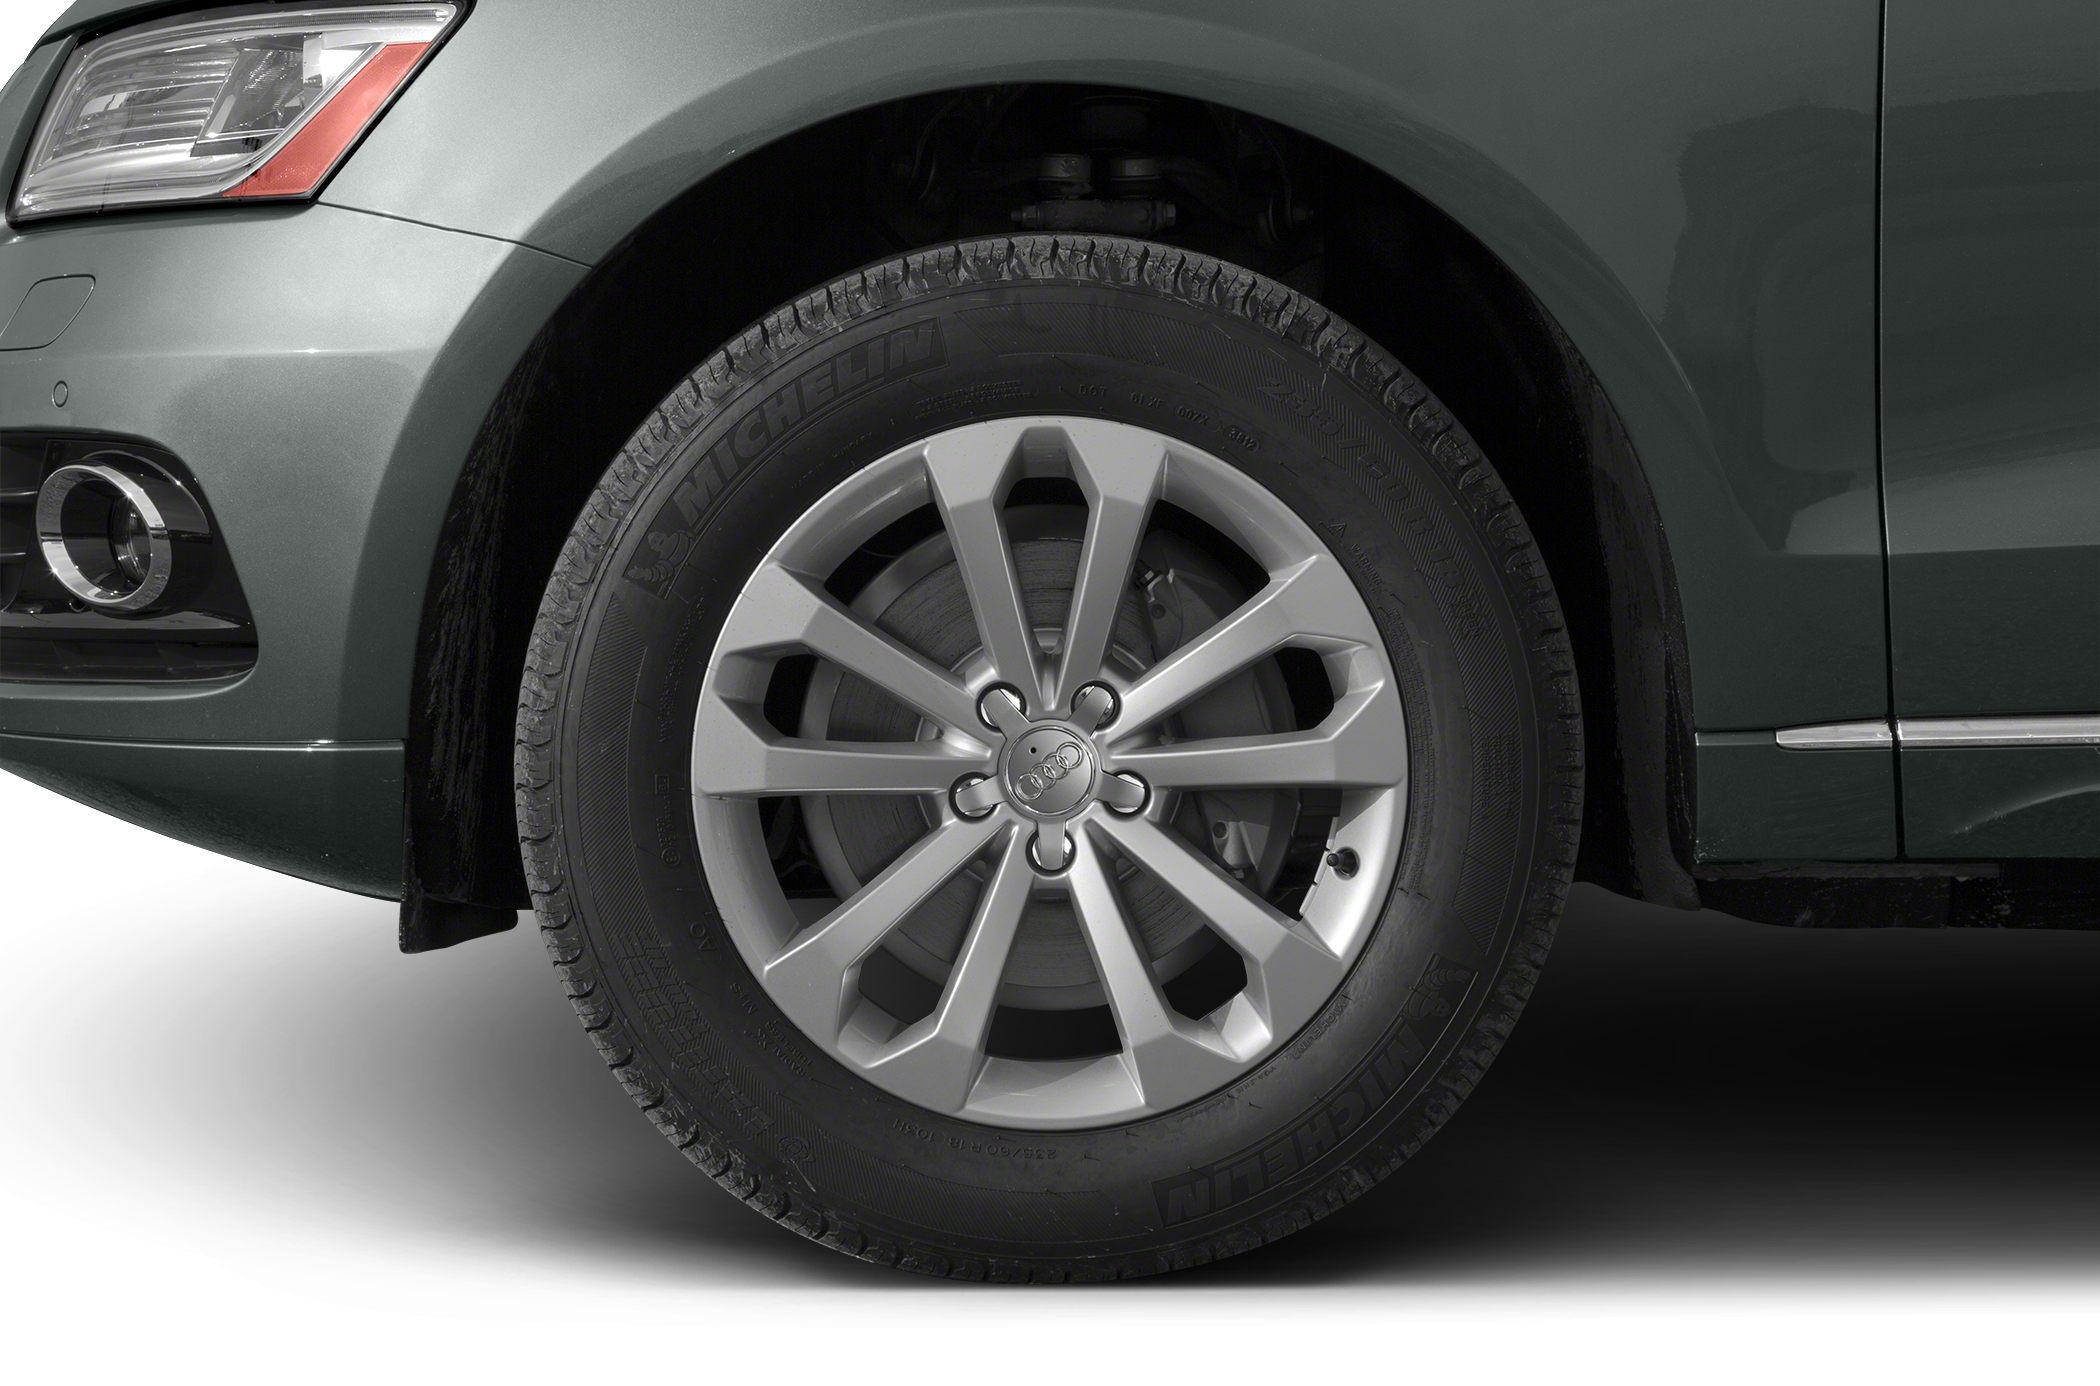 2014 audi q5 suv 20t premium 4dr all wheel drive quattro sport utility photo 6 audi q5 invoice